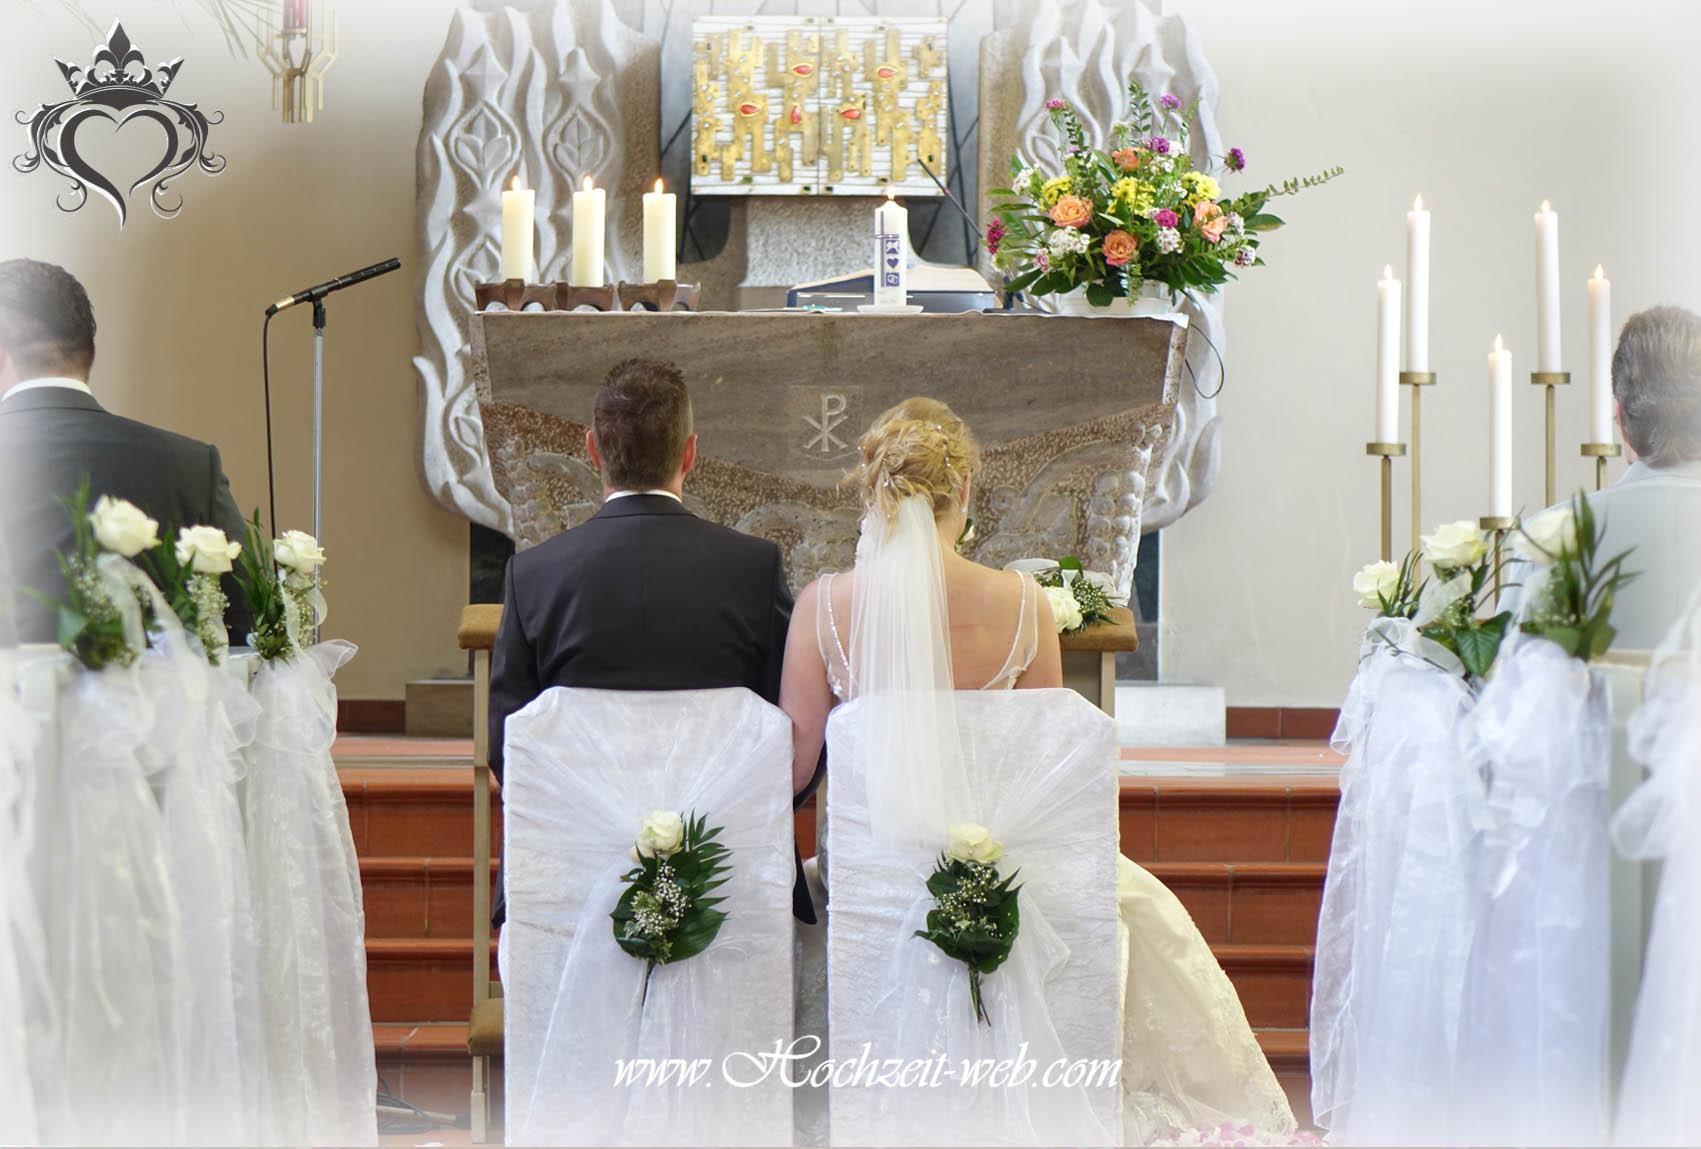 Deko Kirche Hochzeit Stuhle Modeschmuck